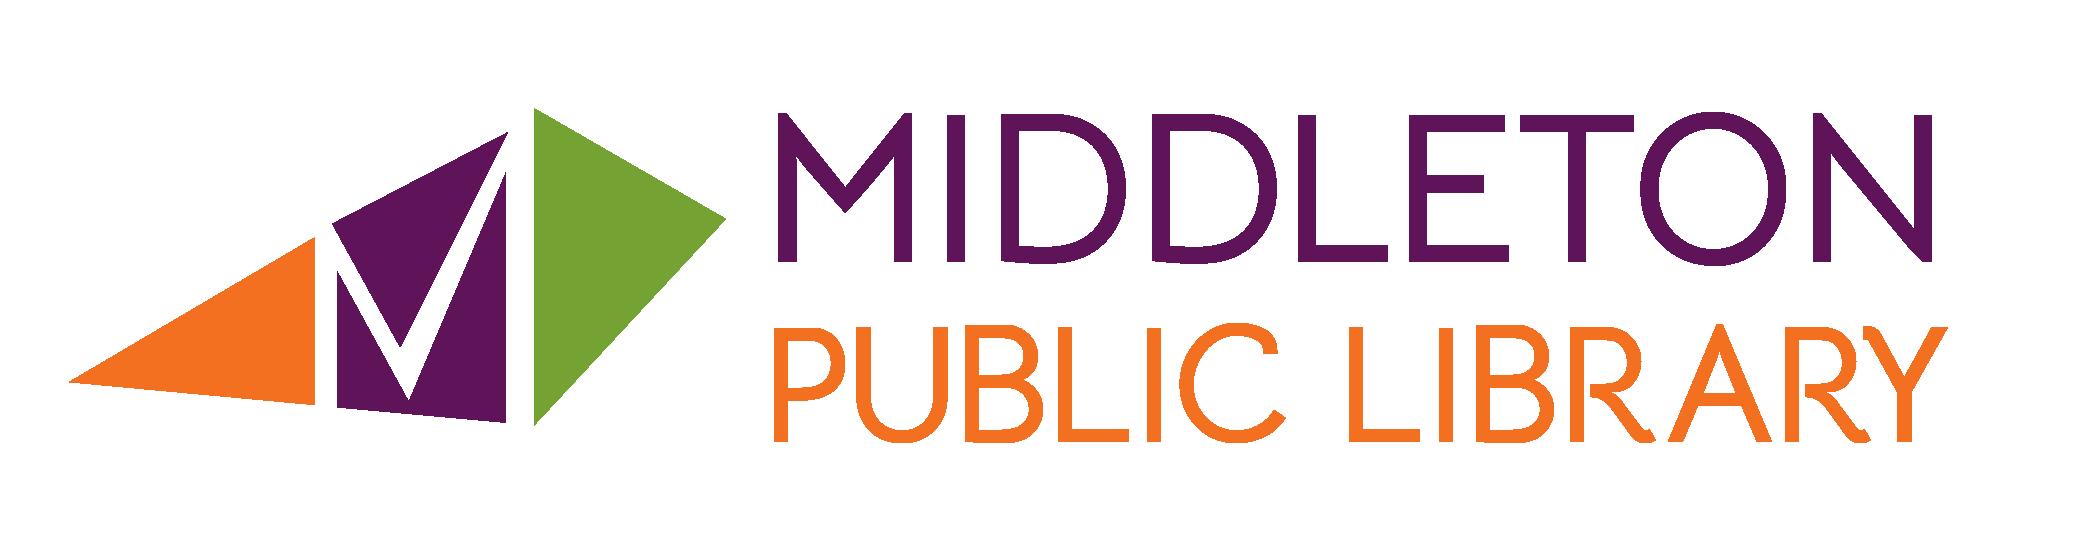 MIDDLETON PUBLIC LIBRARY